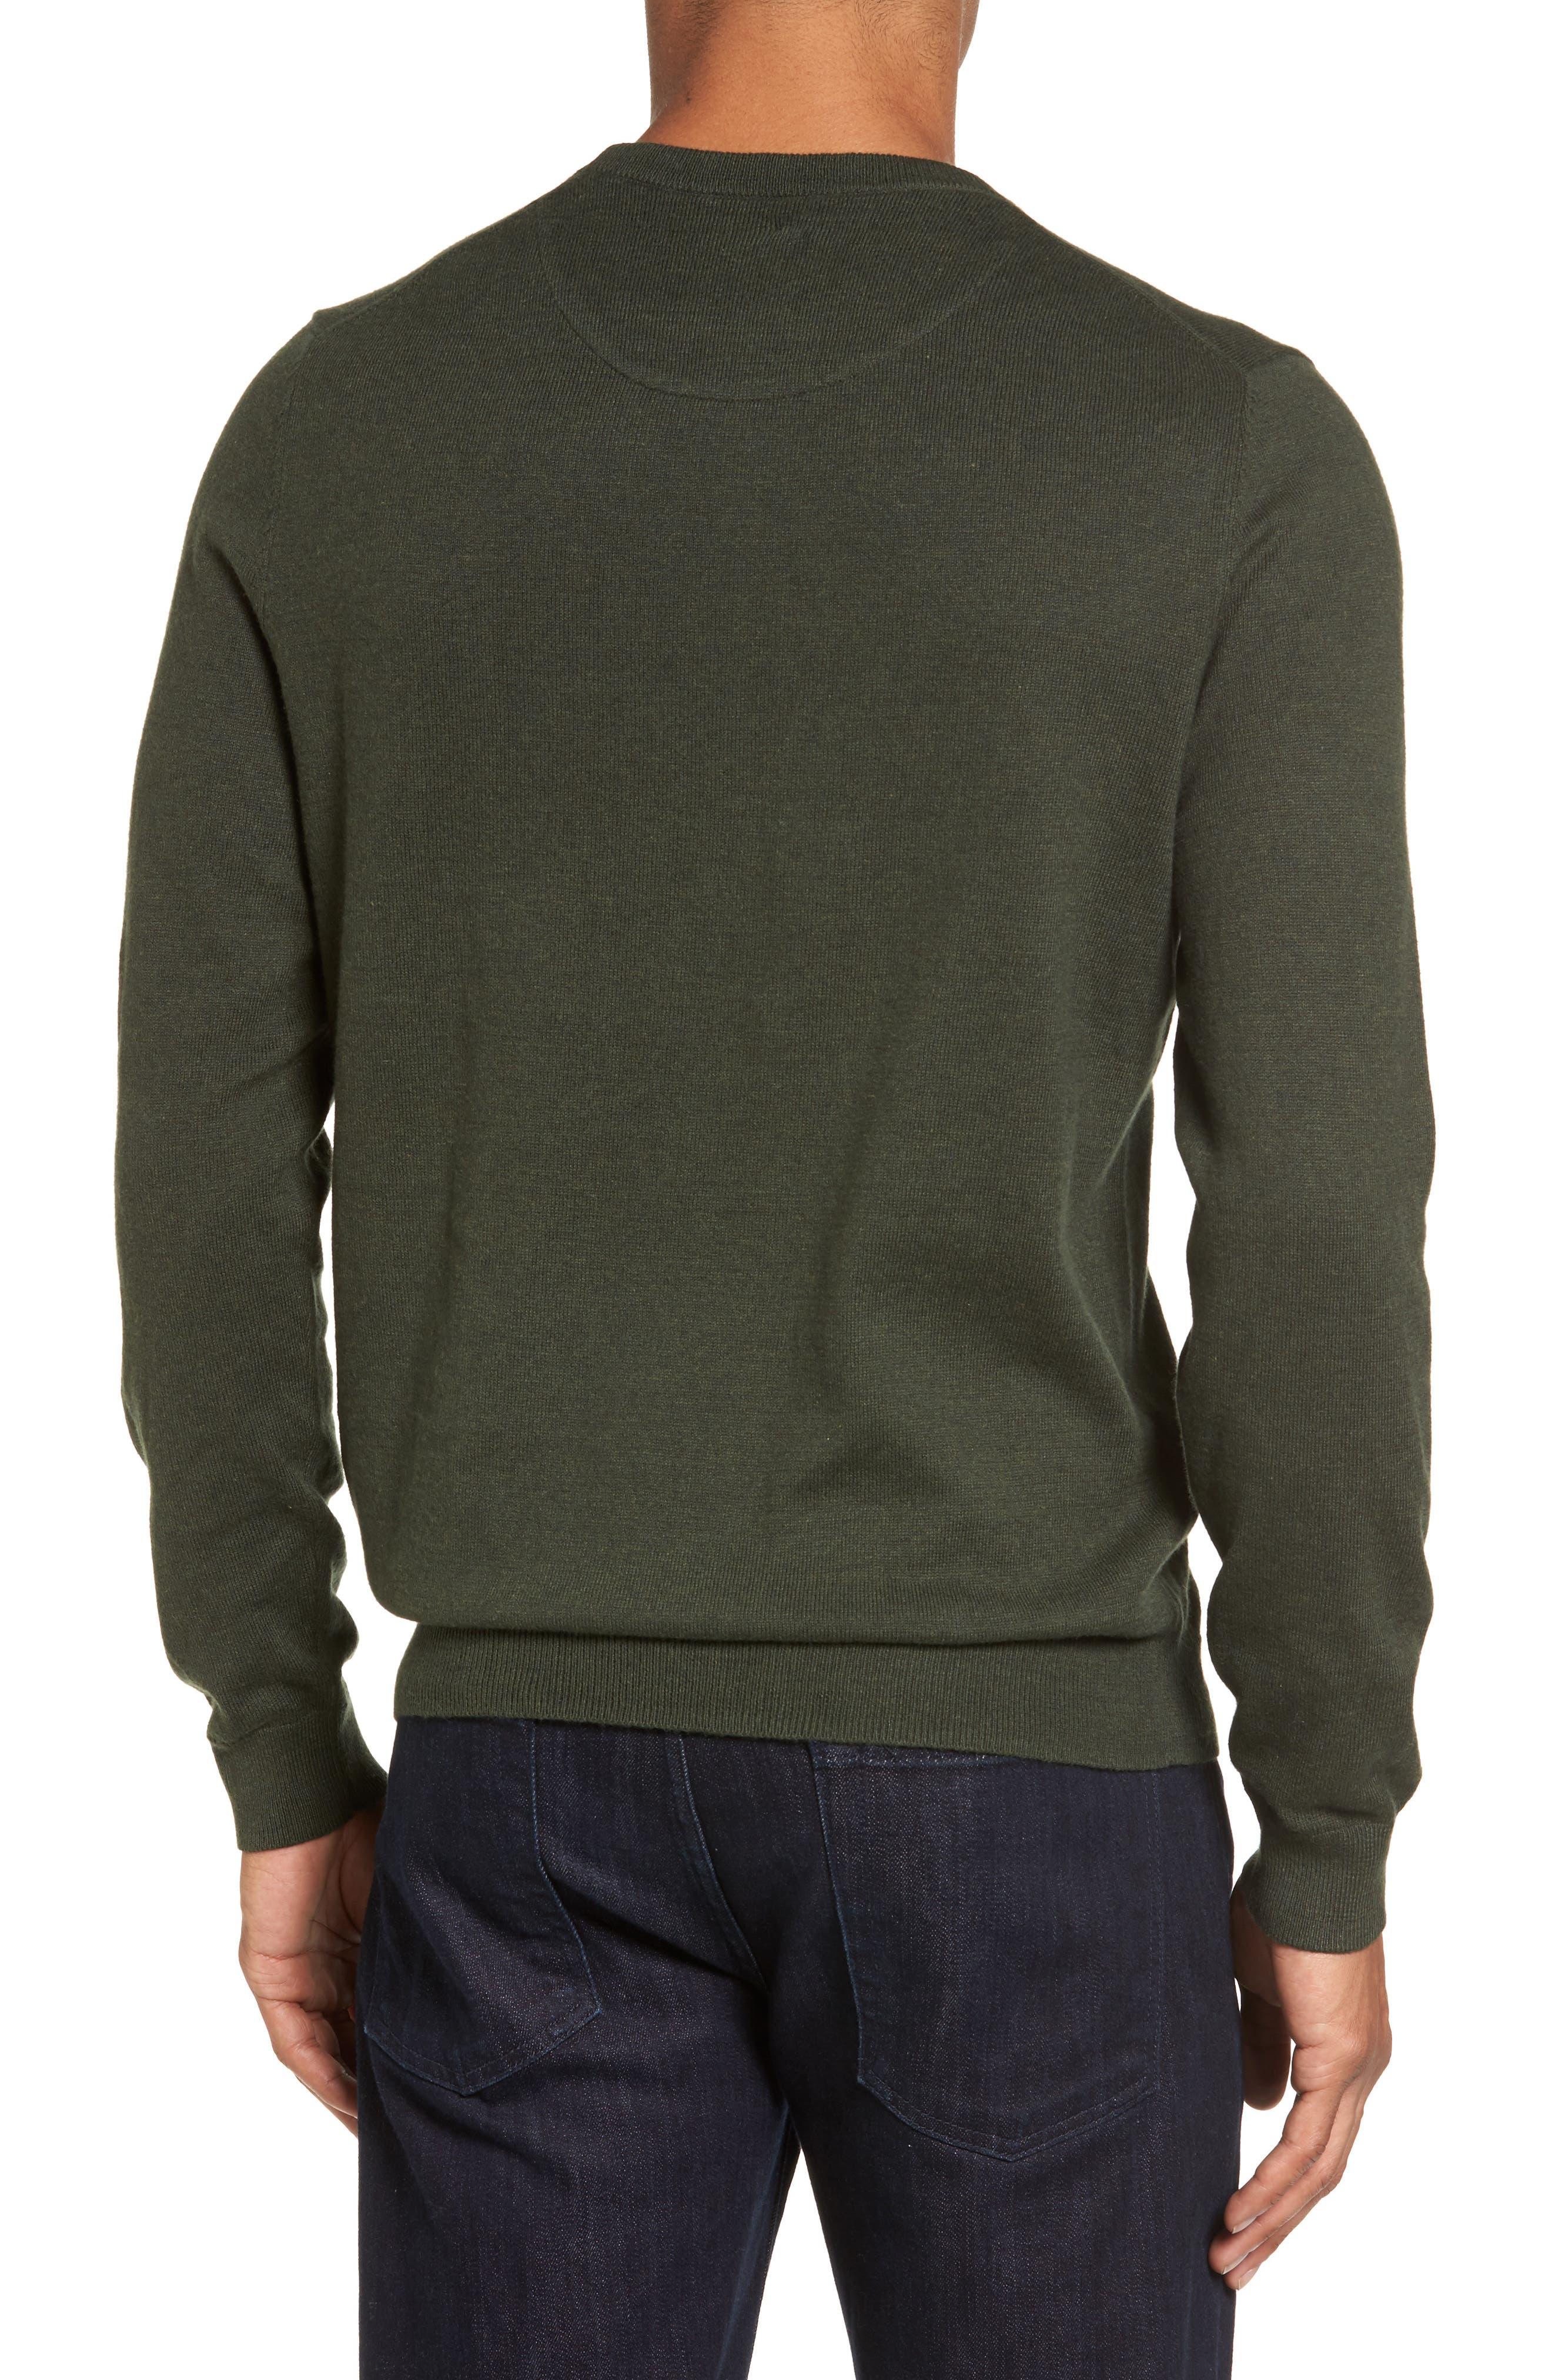 Cotton & Cashmere Crewneck Sweater,                             Alternate thumbnail 2, color,                             Green Deep Pine